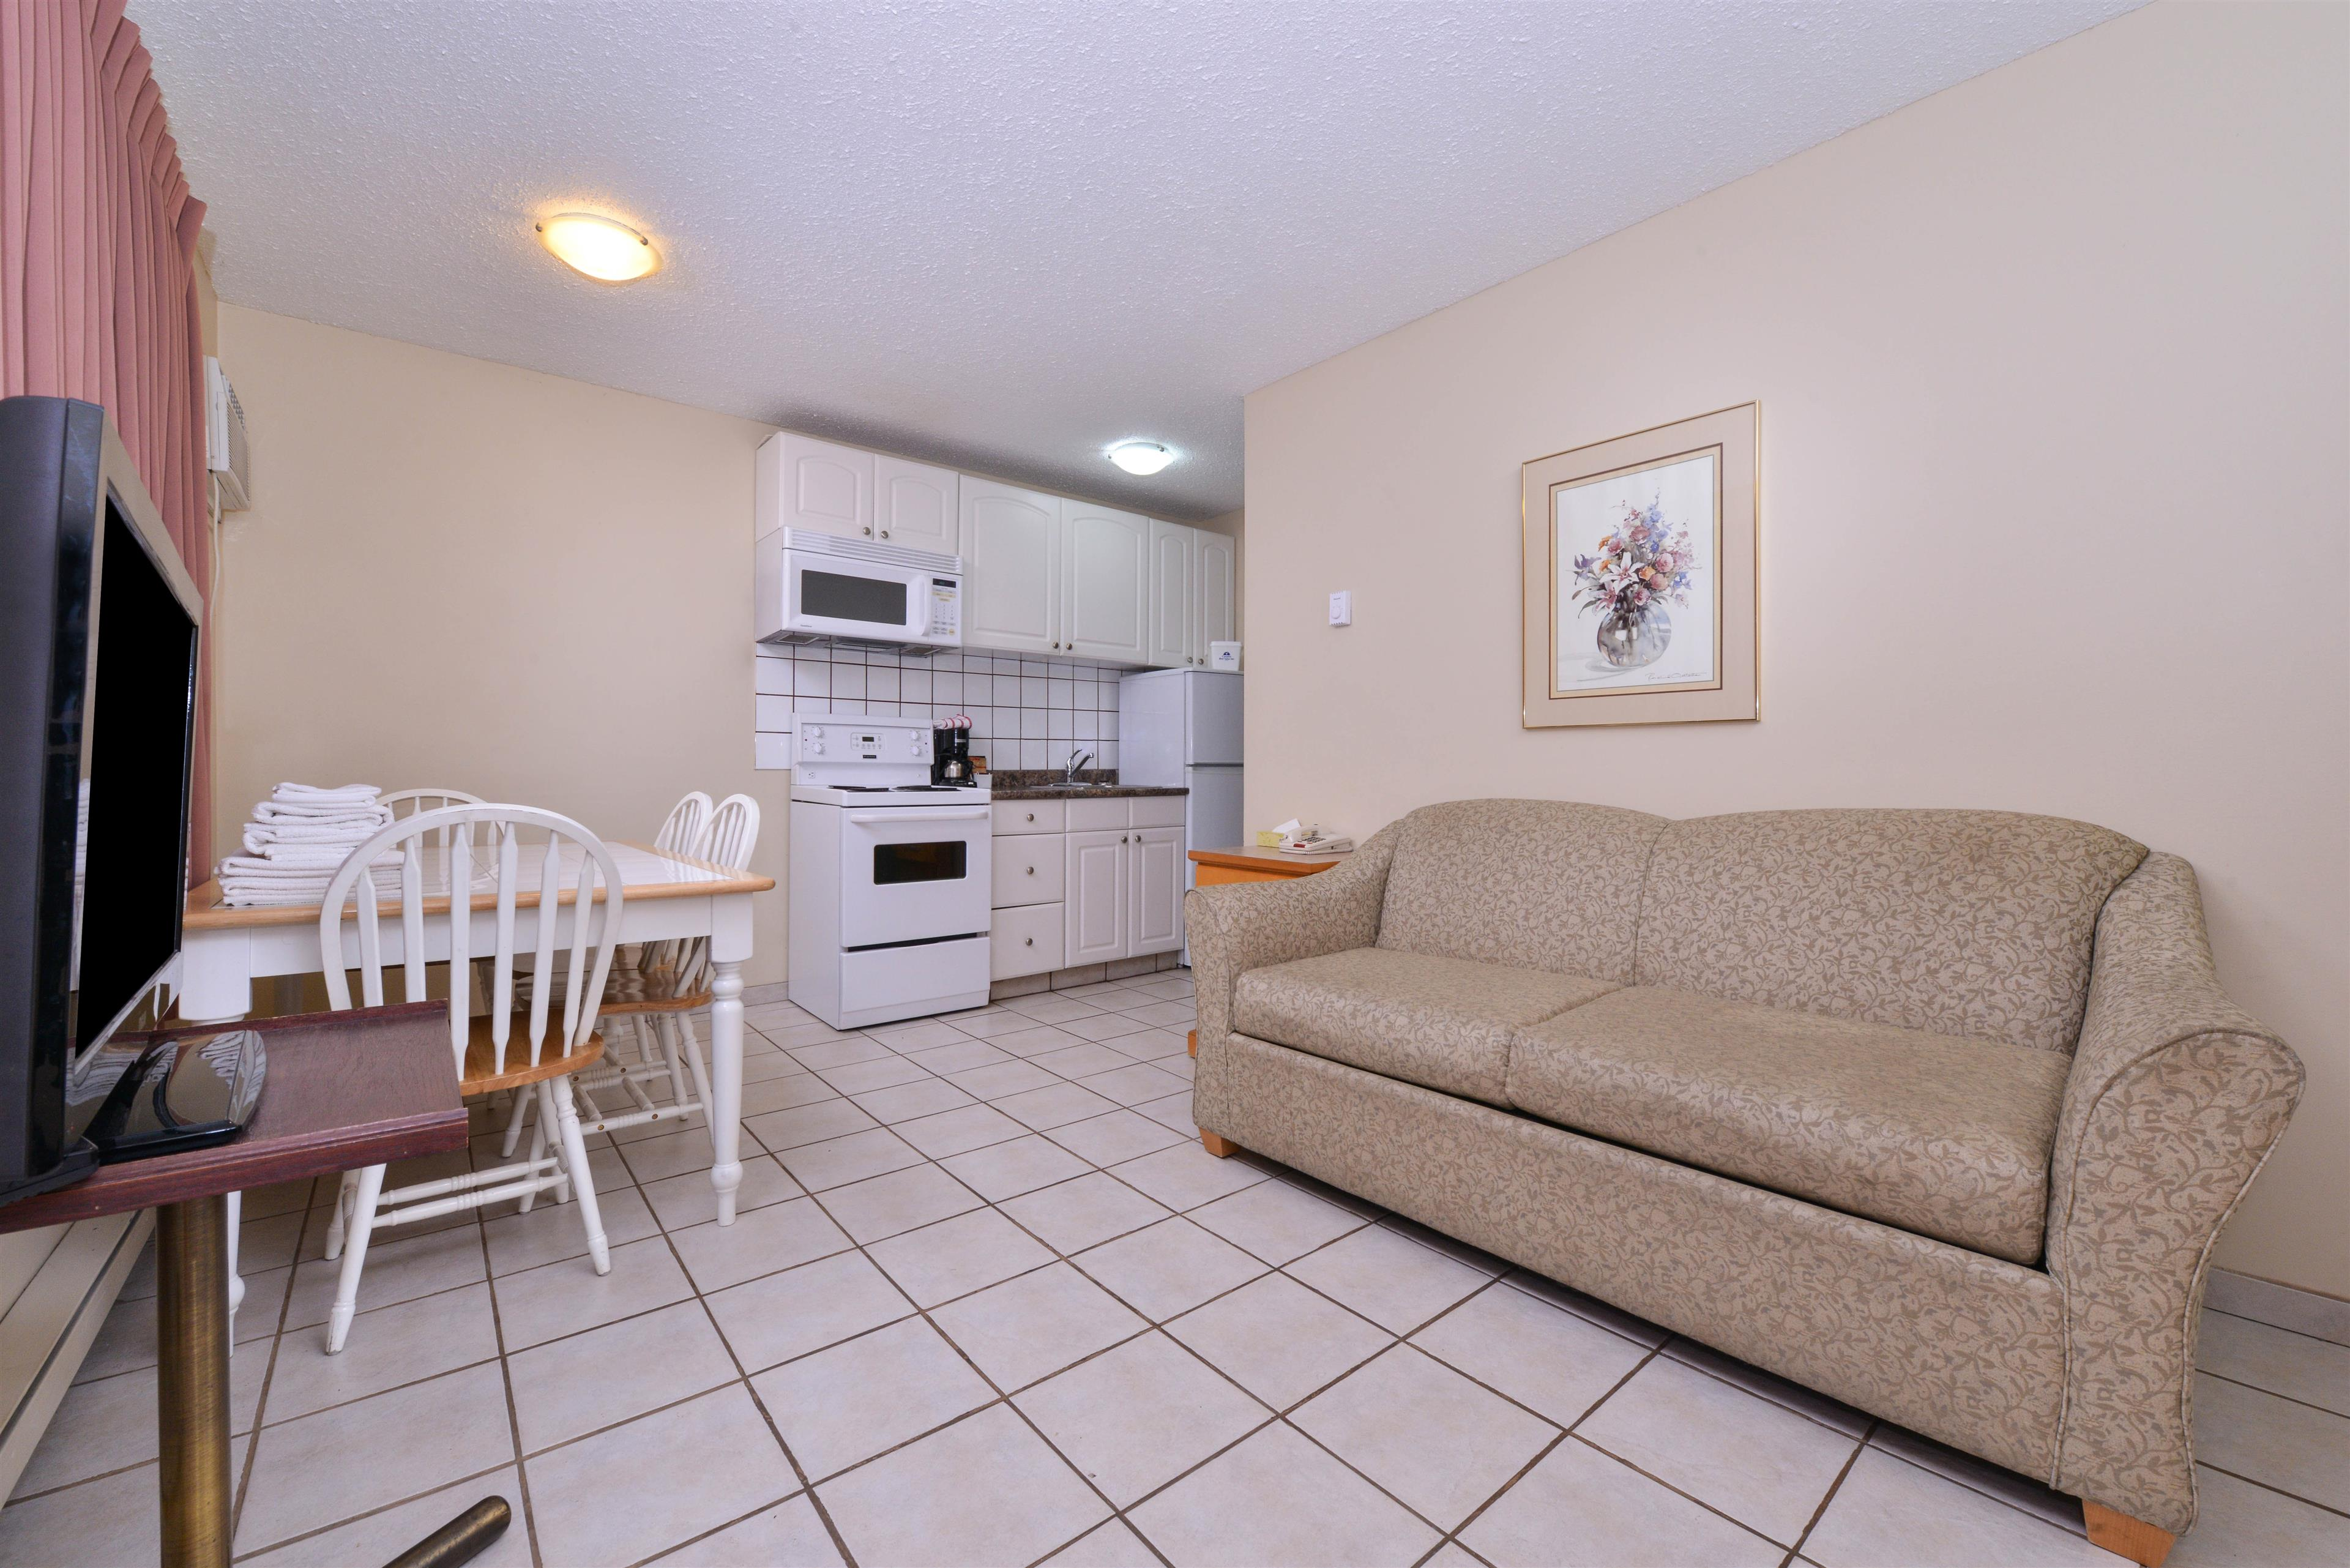 Canadas Best Value Inn & Suites Vernon in Vernon: One Queen Two Twin Beds Suite Amenities